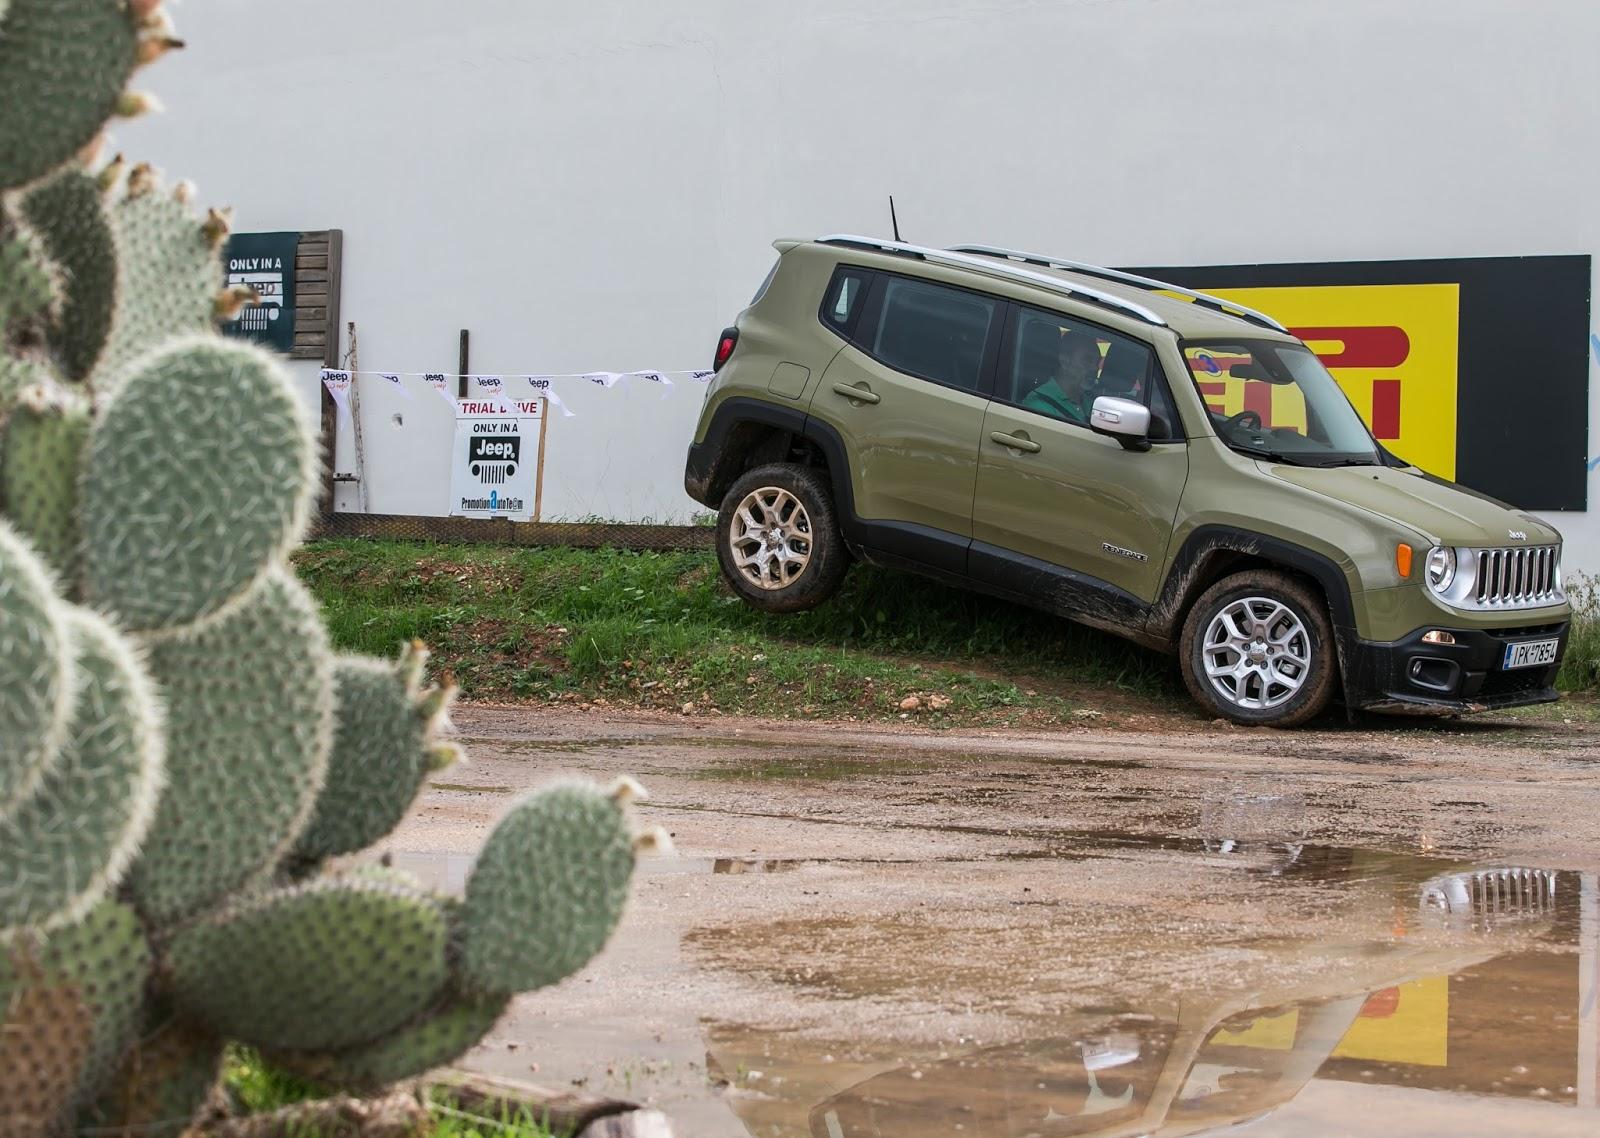 KF 1606 Πετάμε ένα Jeep Renegade σε λάσπες, πέτρες, άμμο, λίμνες. Θα τα καταφέρει;